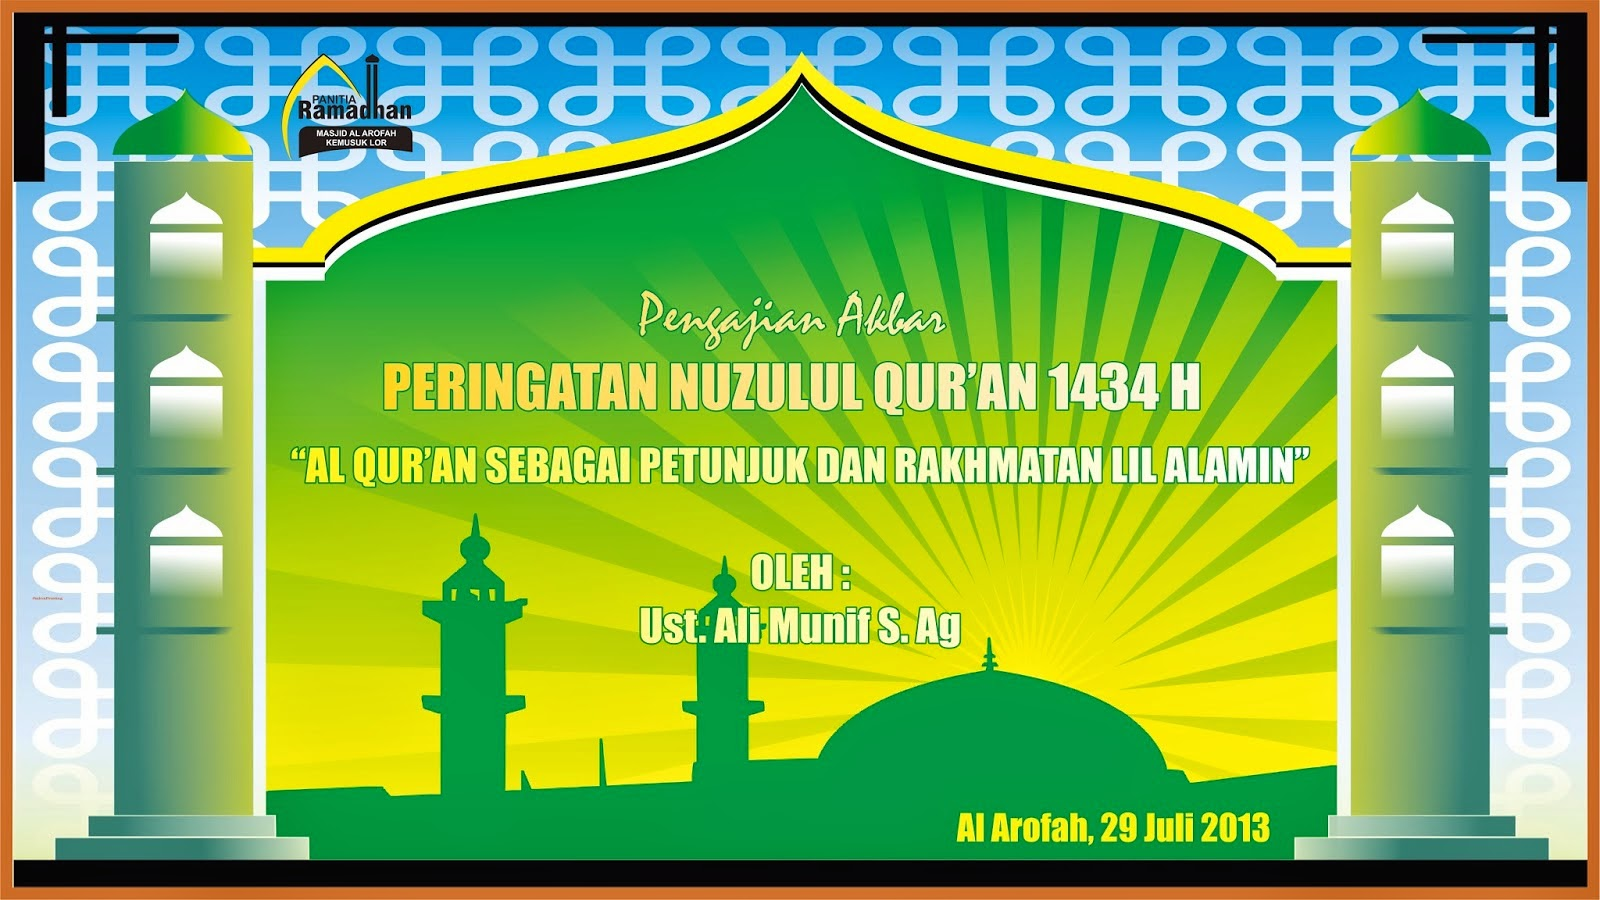 Desain Spanduk Nuzulul Qur'an Coreldraw